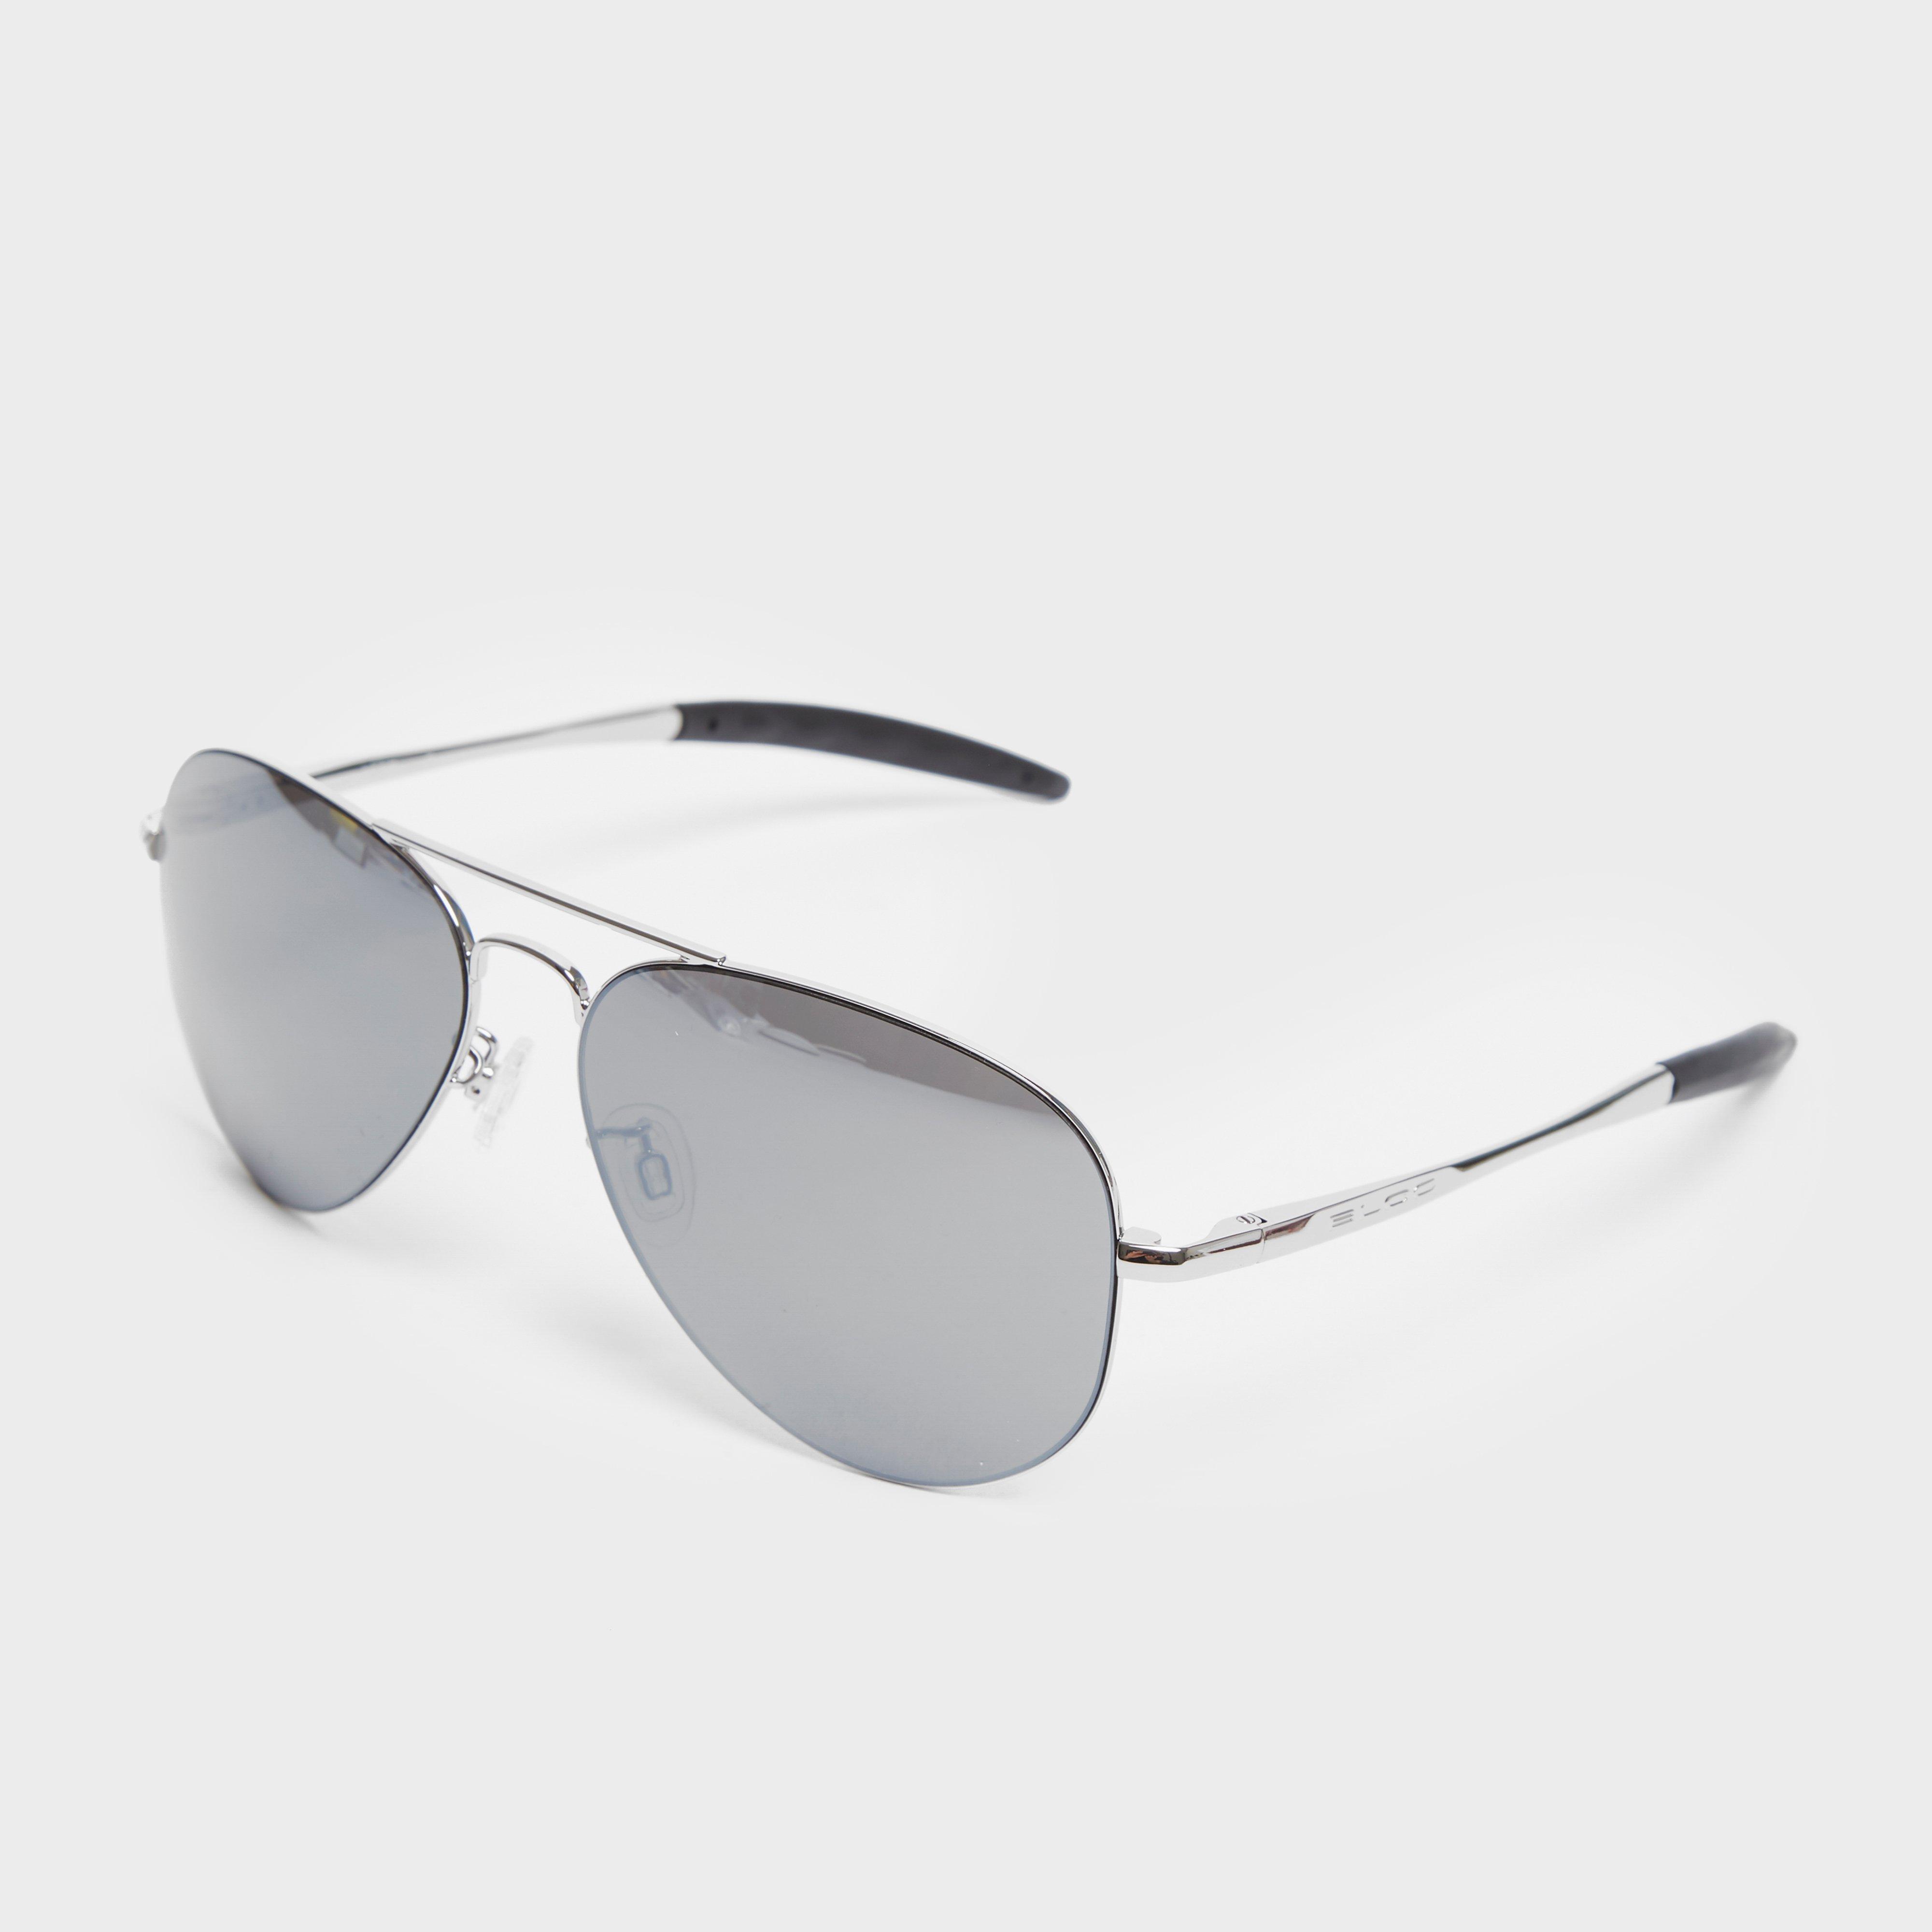 Bloc Darwin F927 Sunglasses